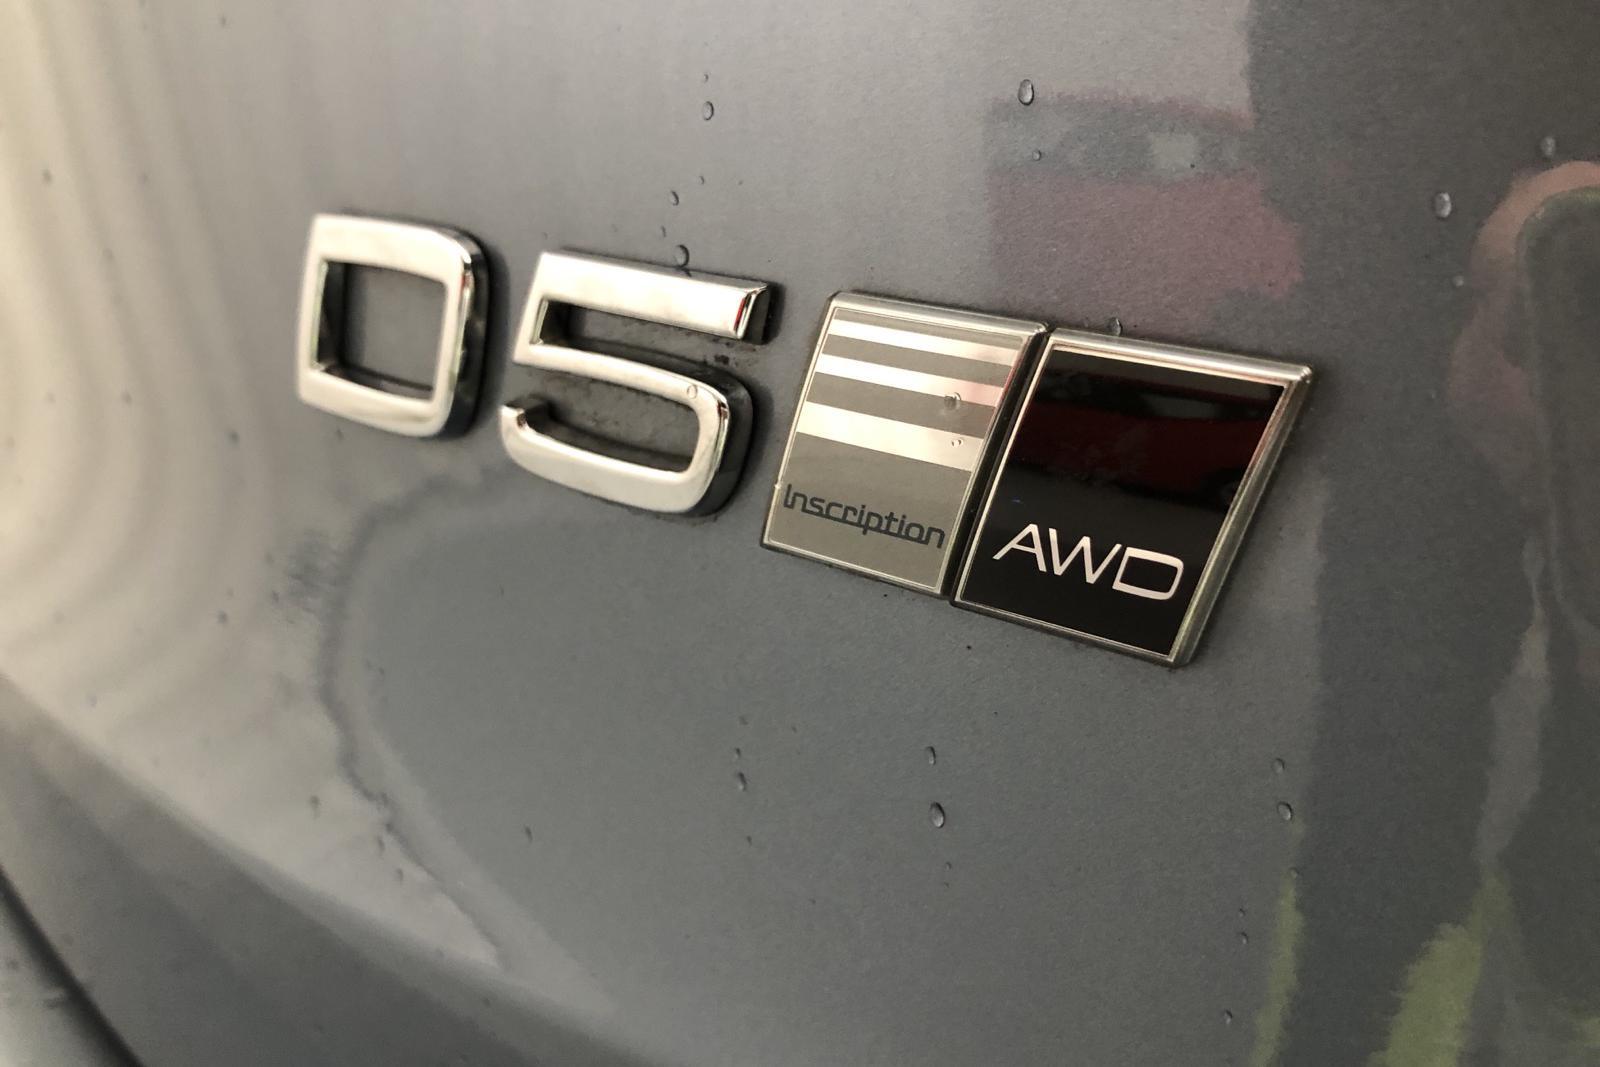 Volvo S90 D5 AWD (235hk) - 8 853 mil - Automat - Light Blue - 2017